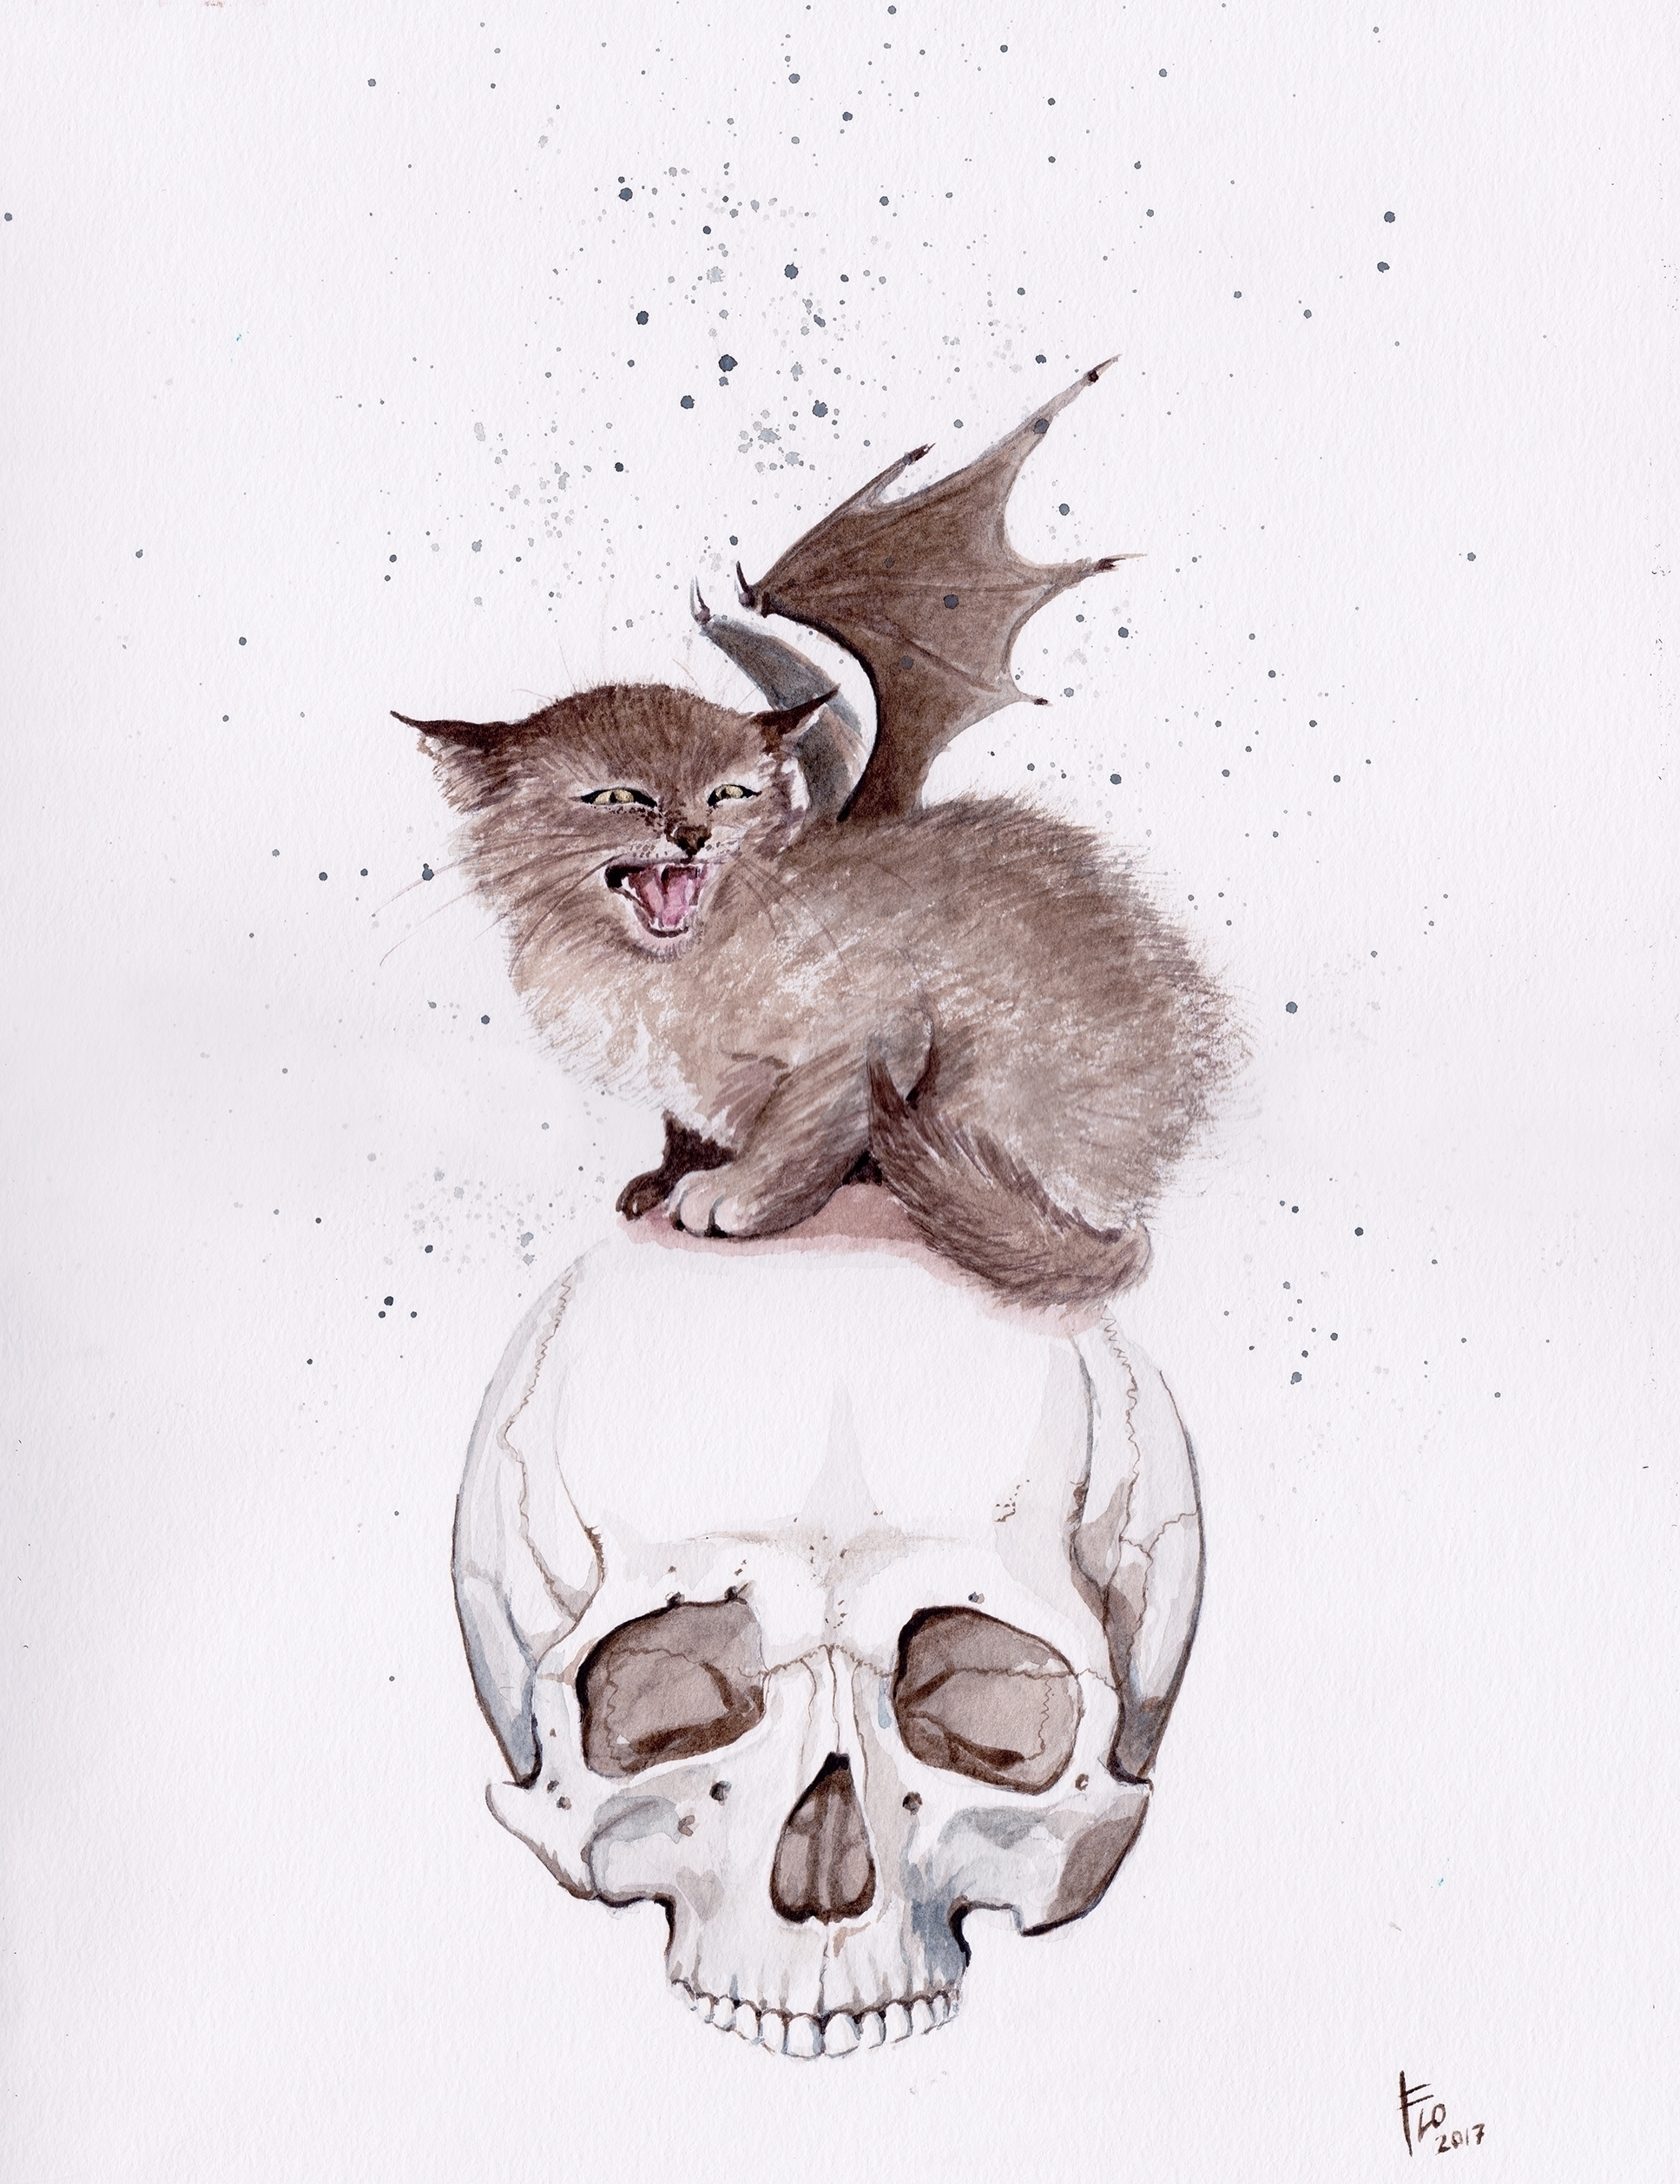 Bat Cat work pop show SALE! Pos - flolmi | ello